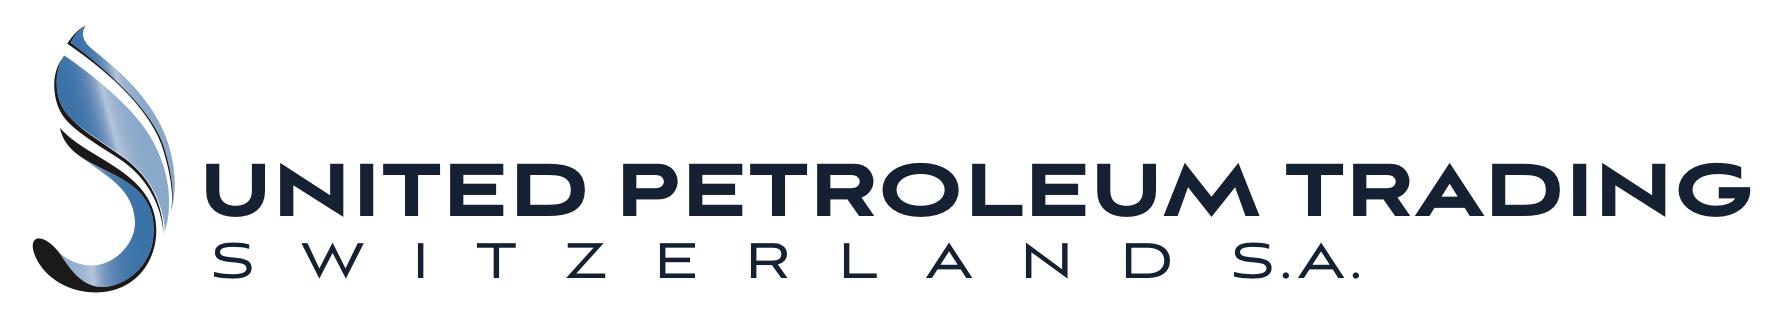 United Petroleum Switzerland SA